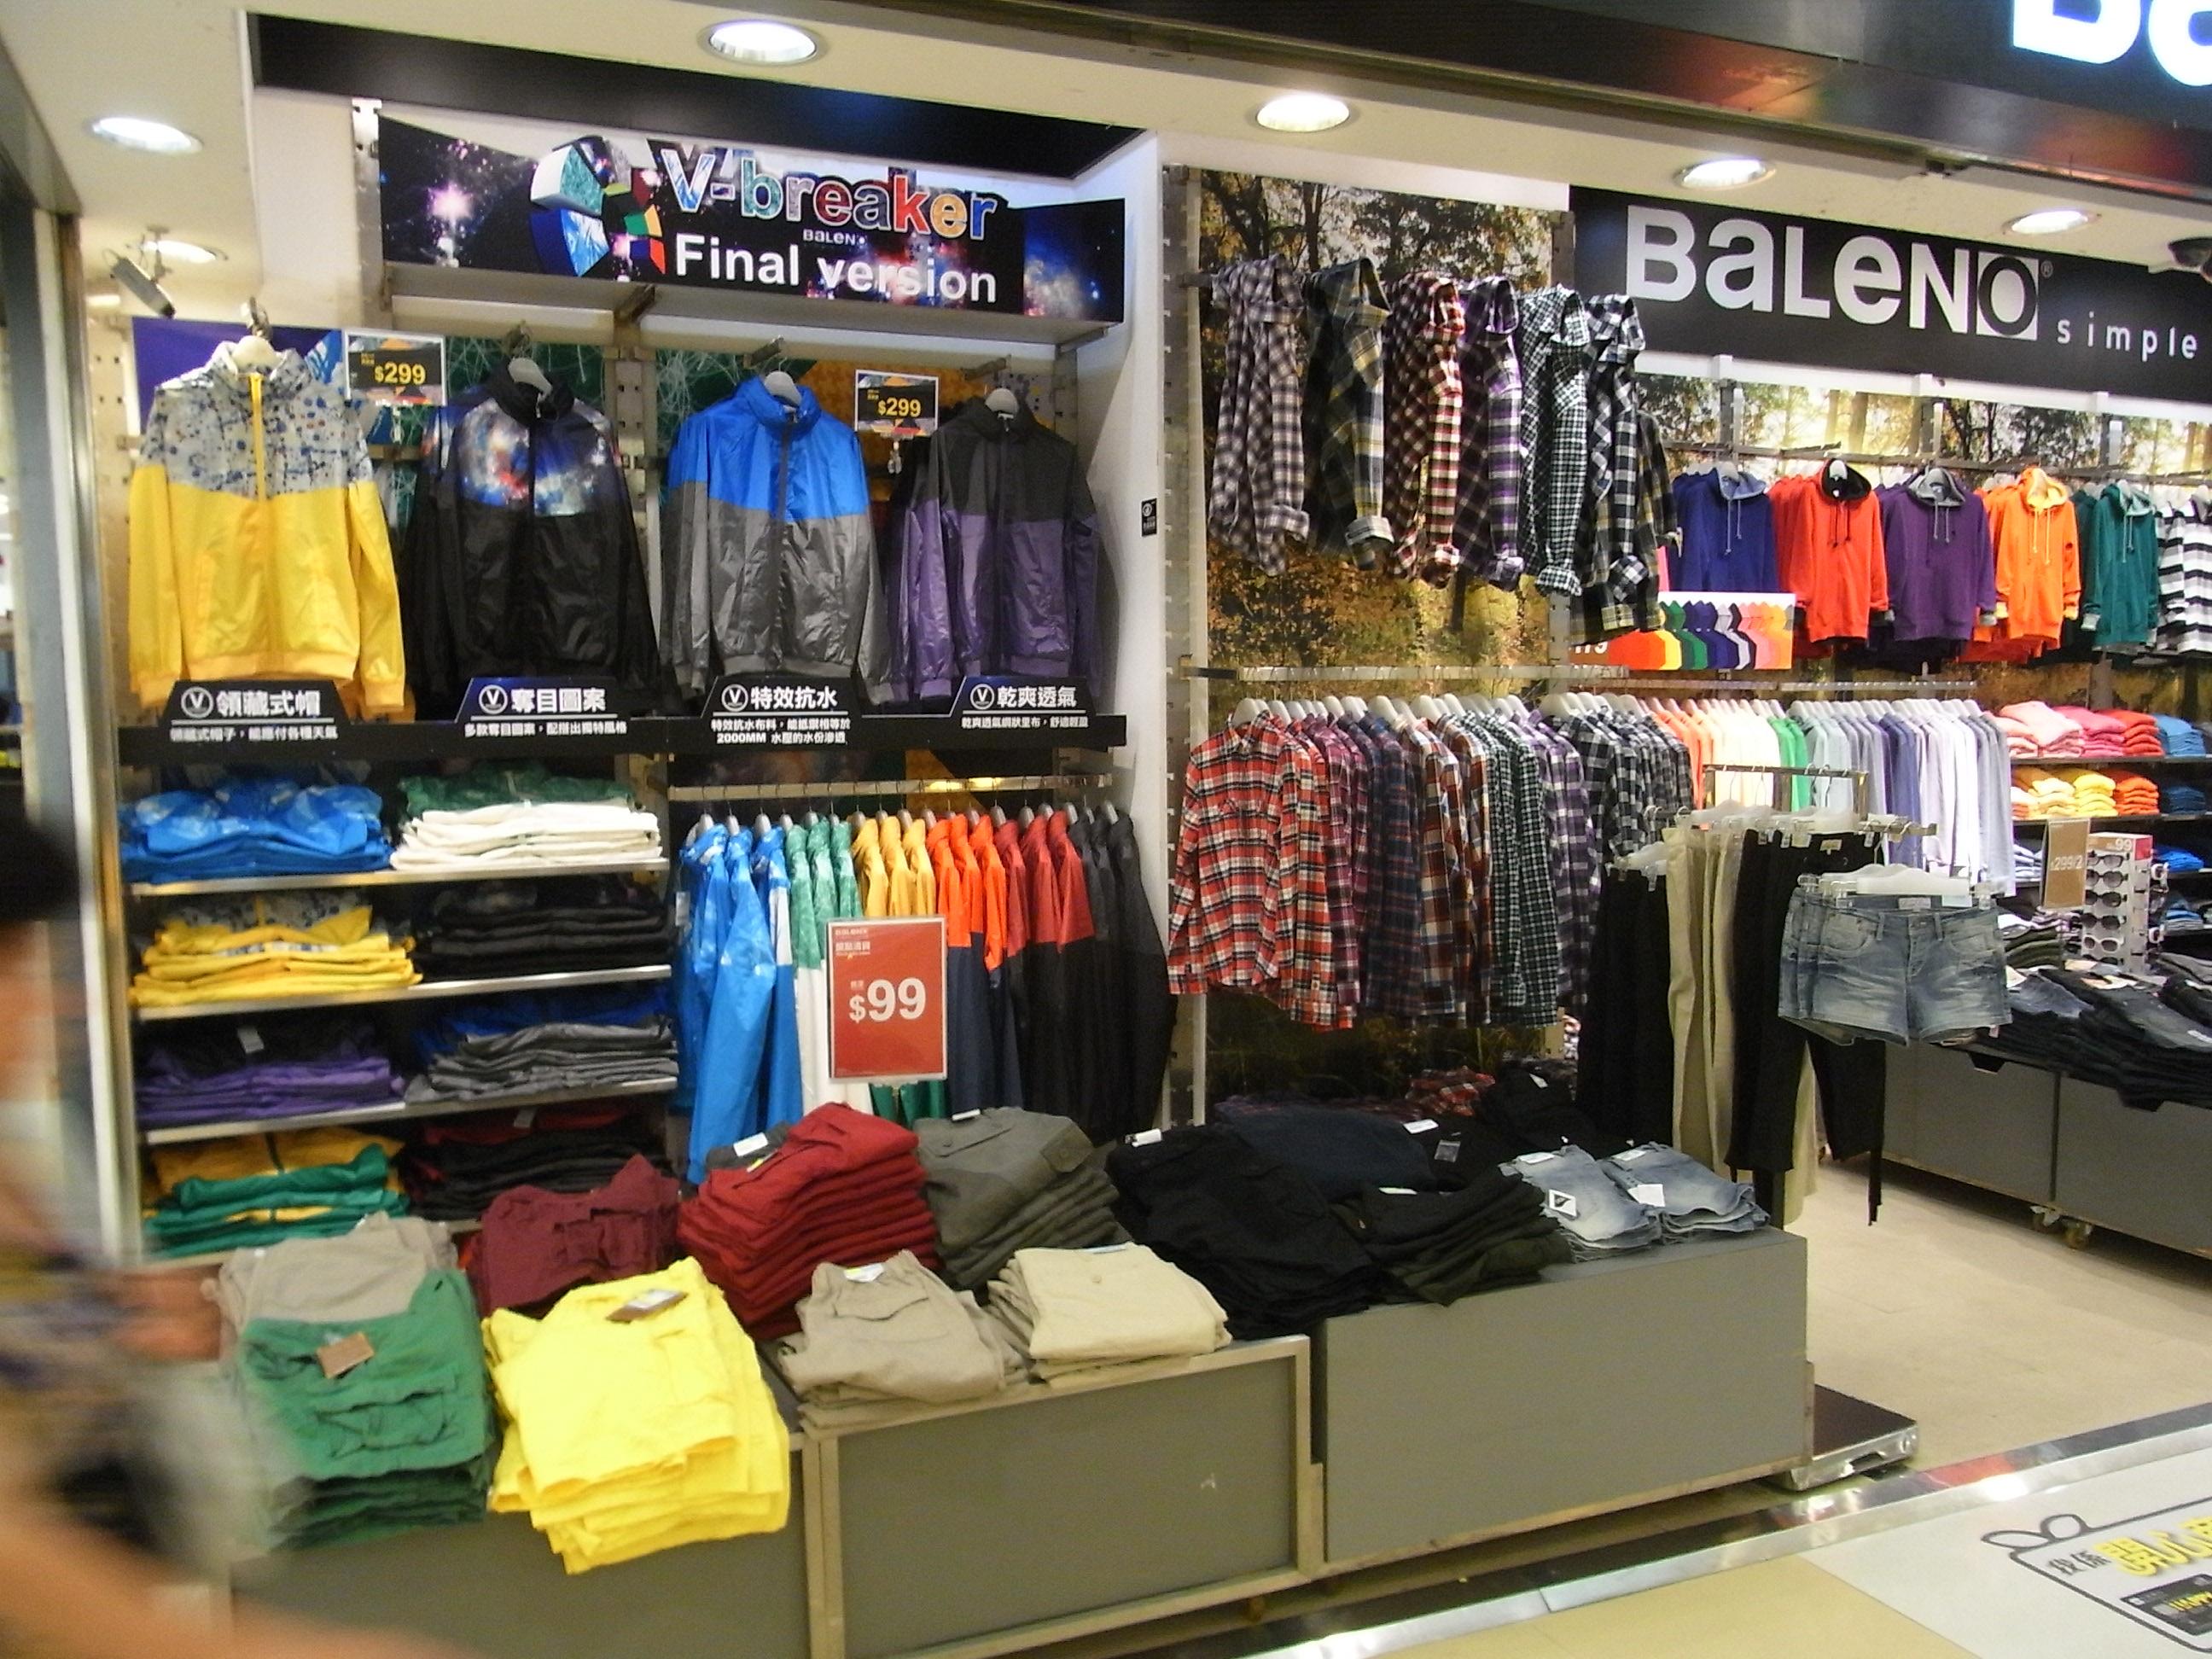 Plaza clothing stores